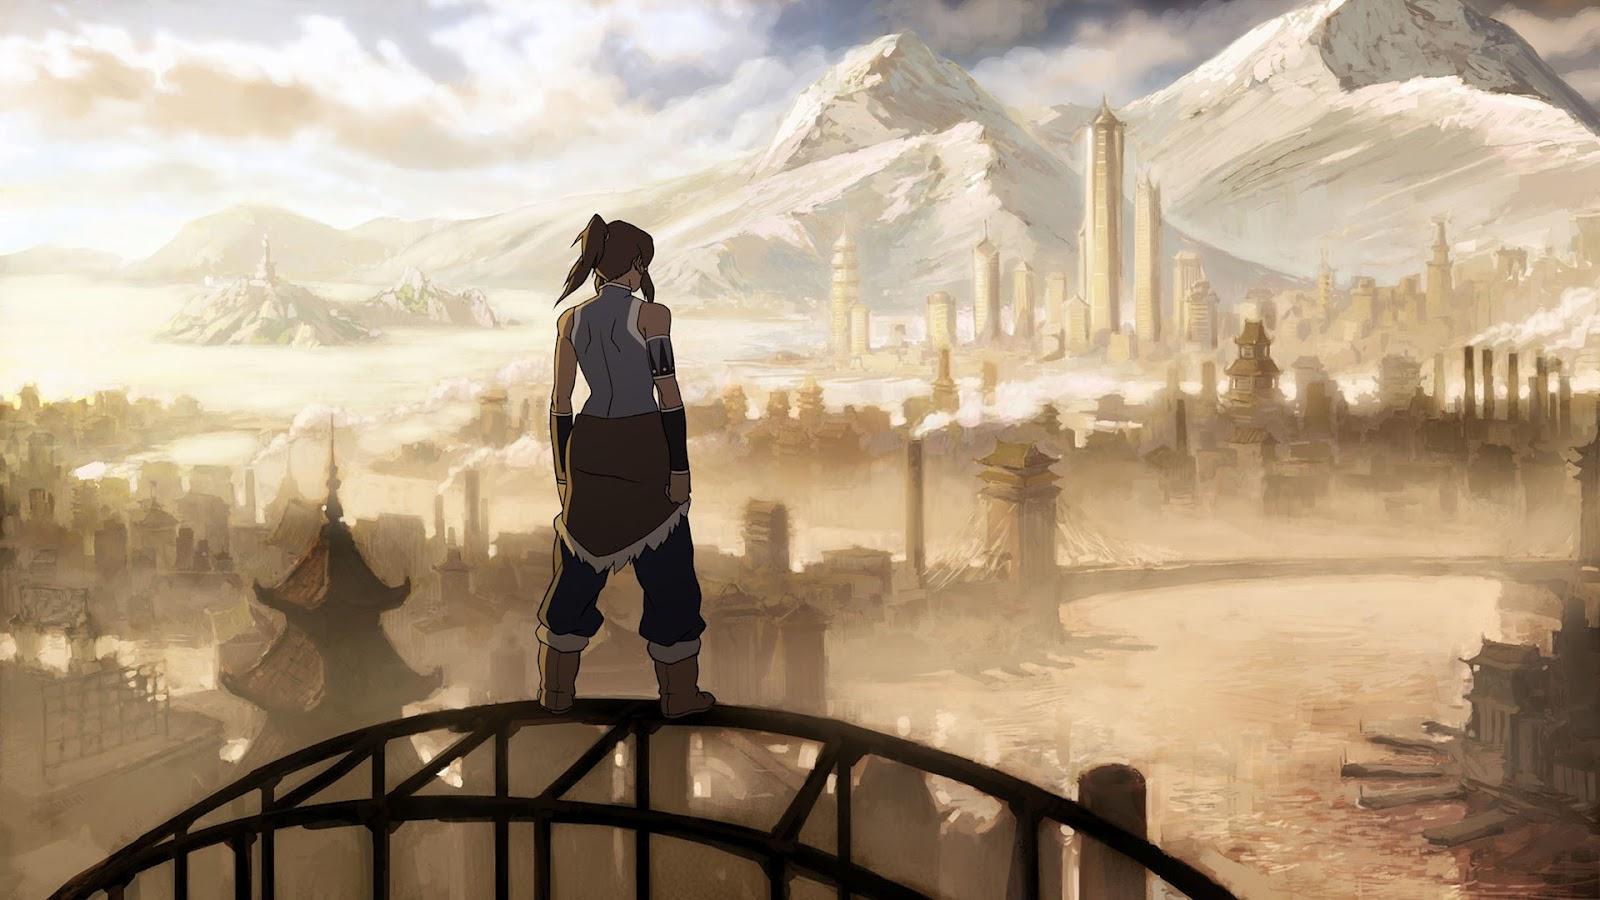 Dwonload Avatar the Legend of Korra PowerPoint Backgrounds 1600x900